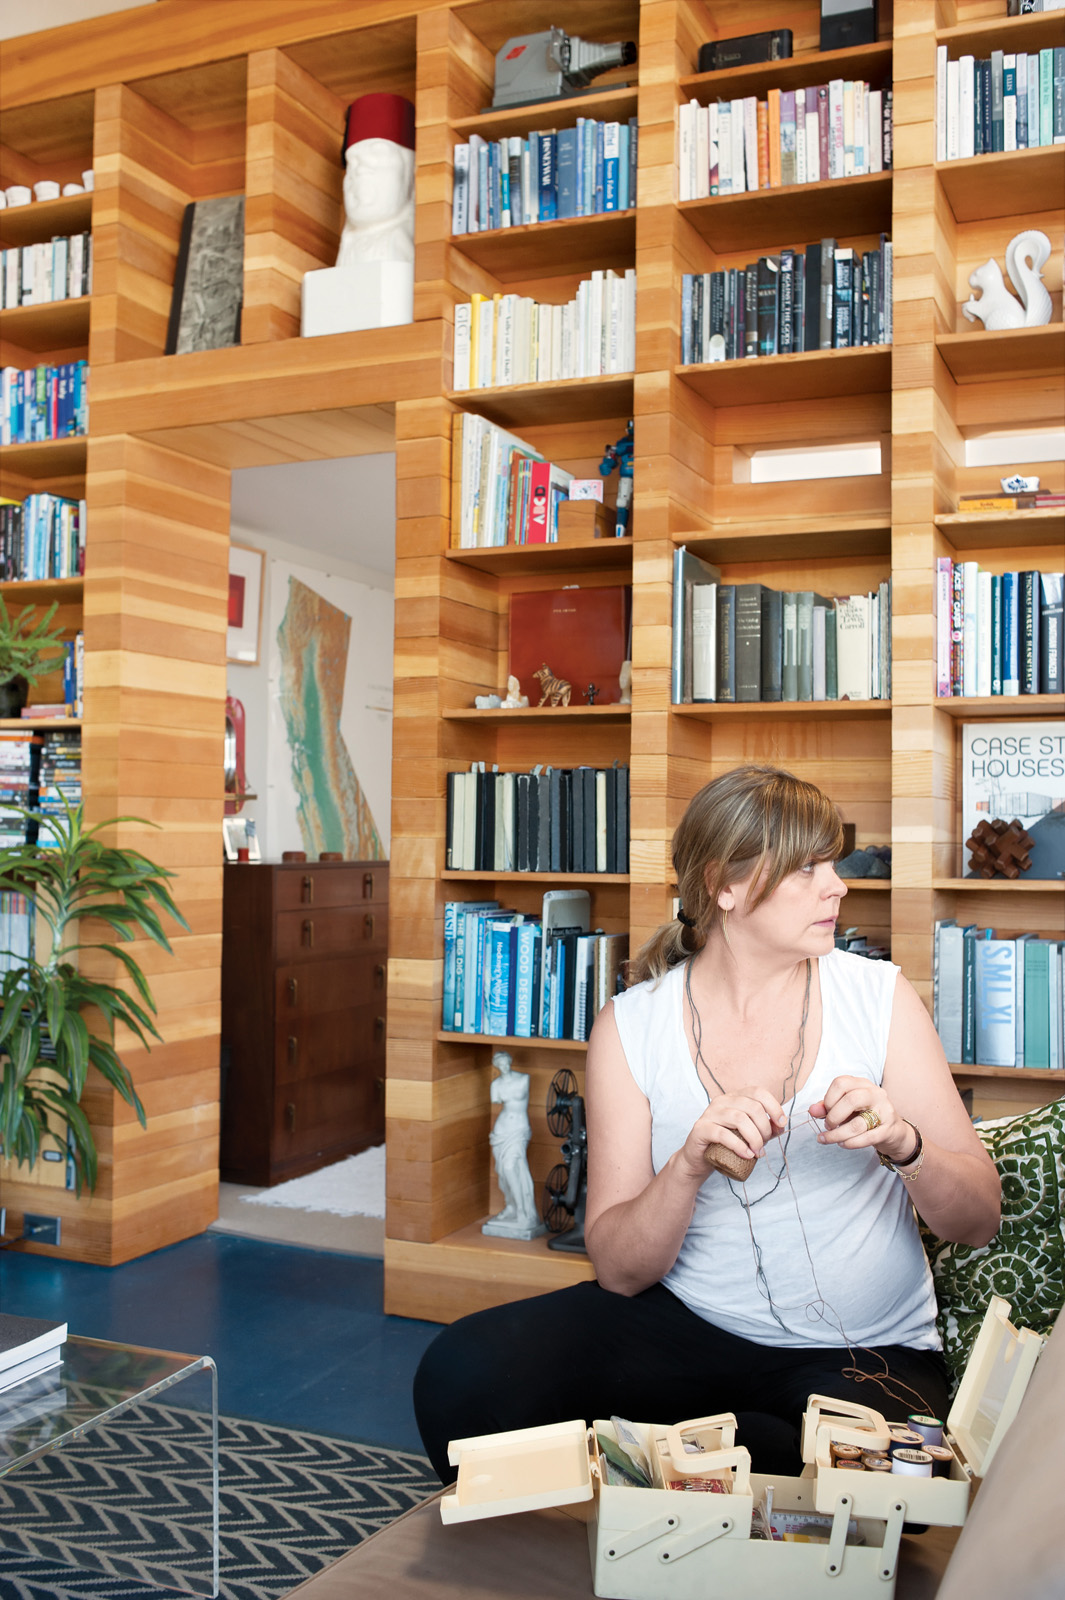 Modern bookshelf in a renovated home